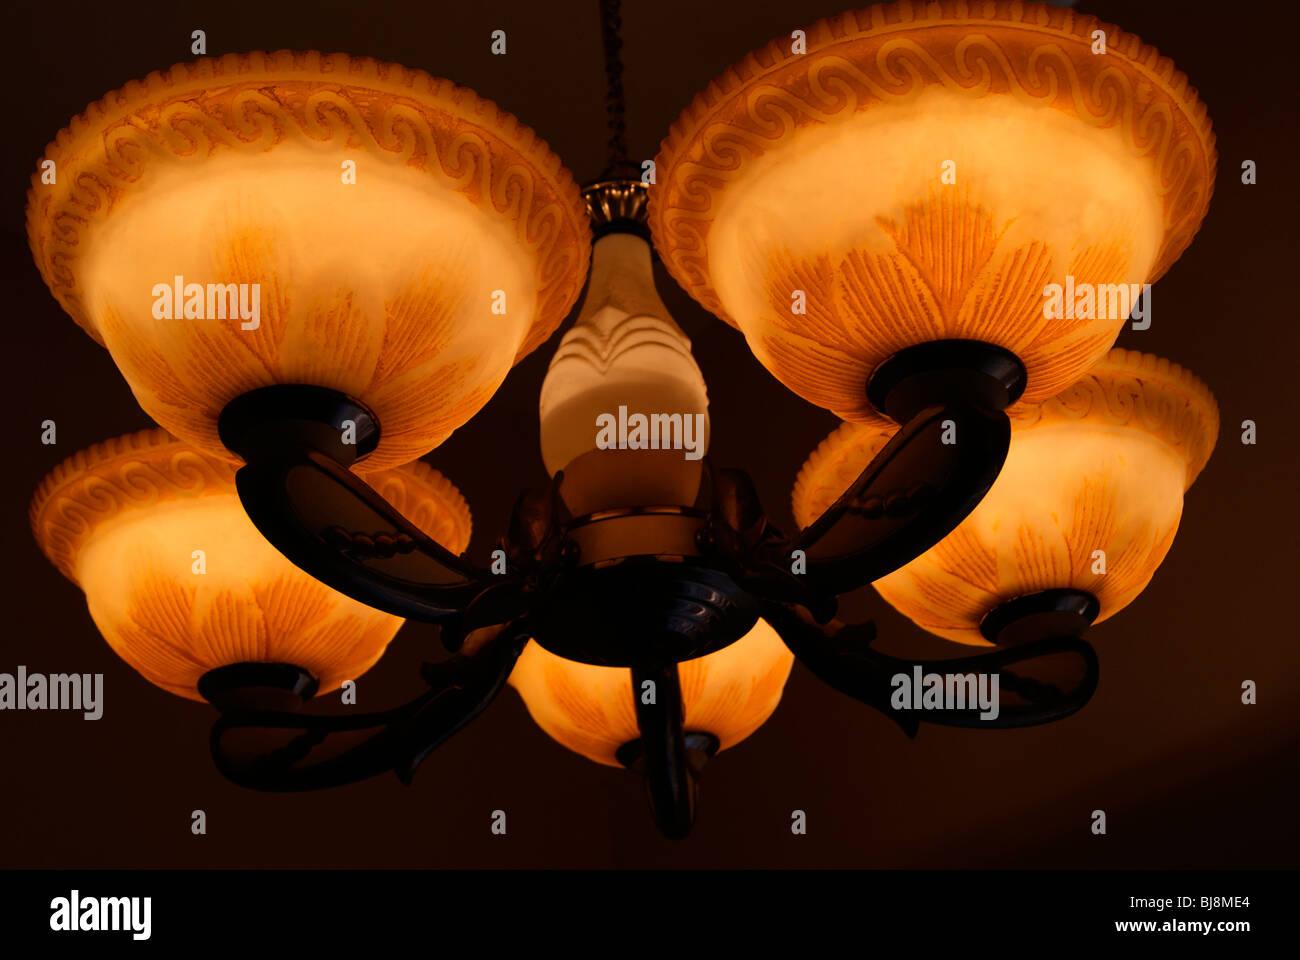 Kronleuchter Hängelampe ~ Kronleuchter lampe stockfotos & kronleuchter lampe bilder alamy